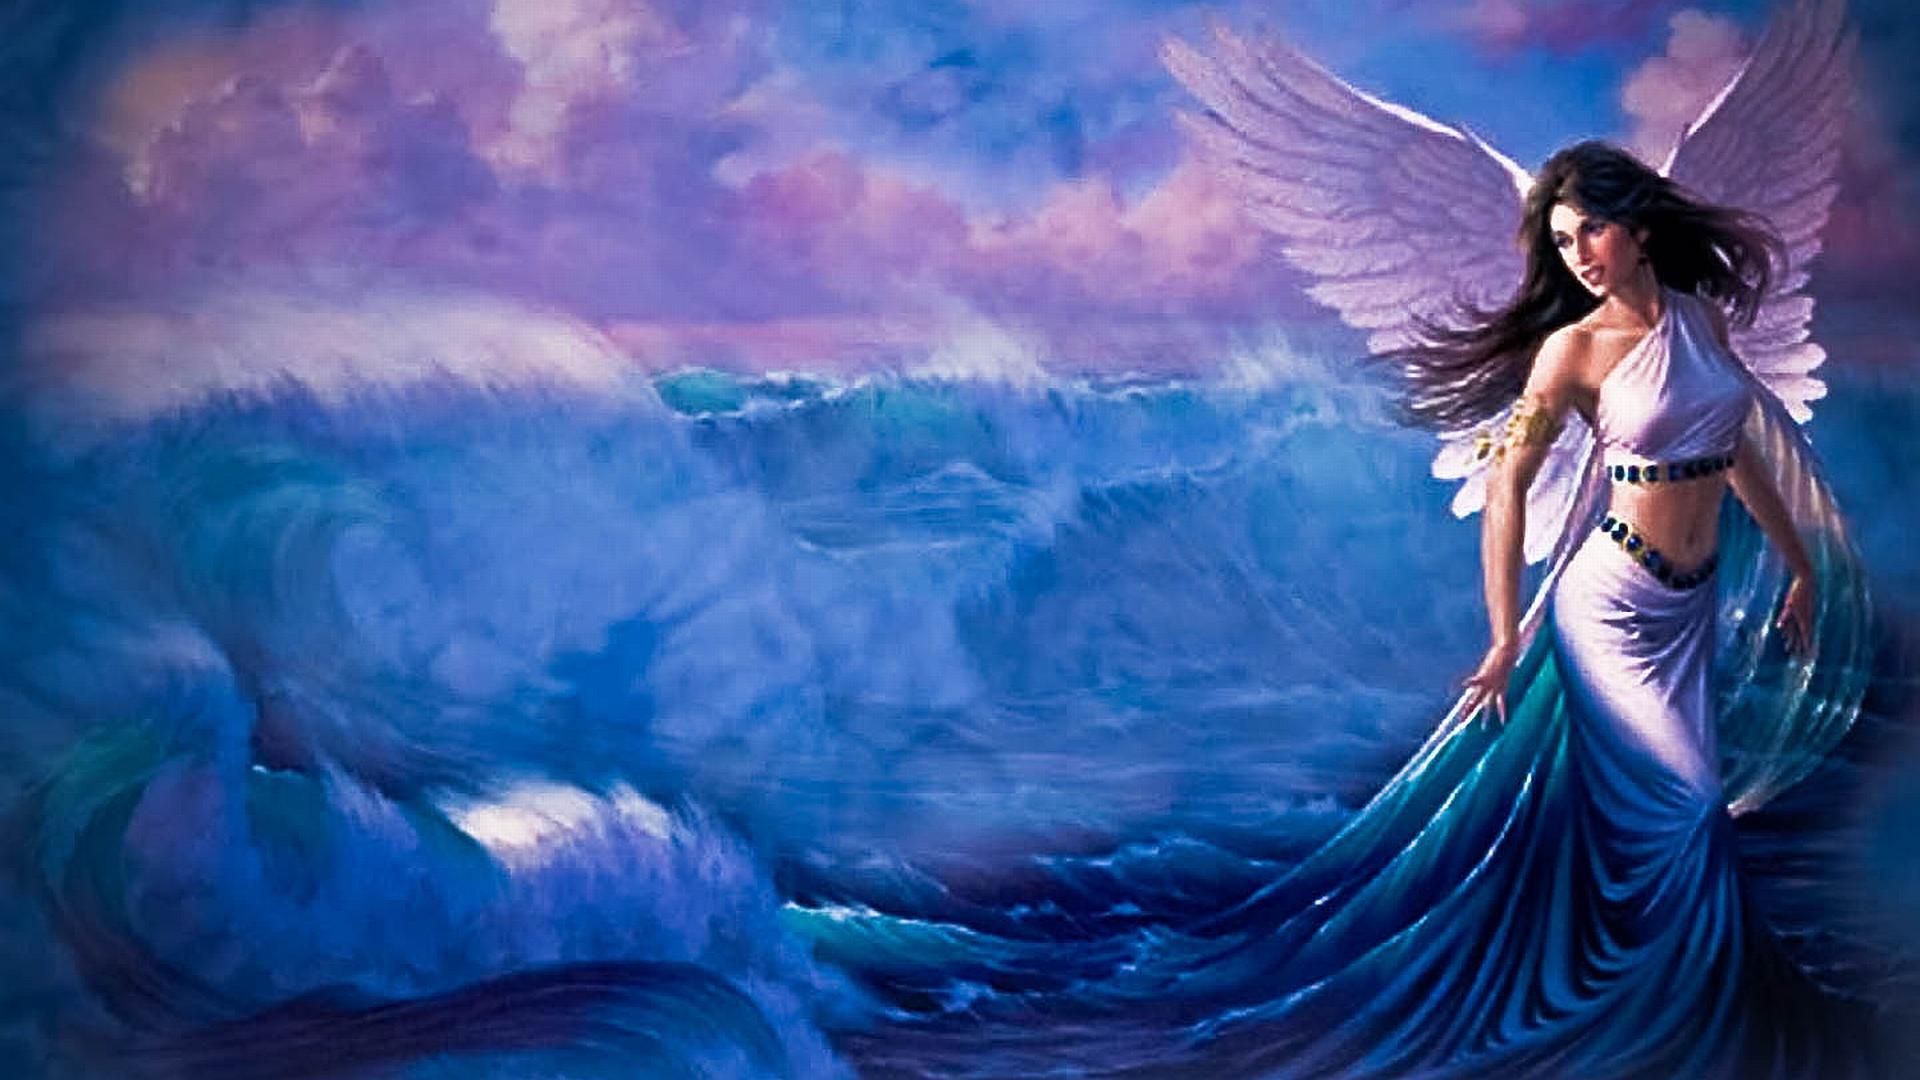 Fantasy-Angel-wallpaper-wp3805203